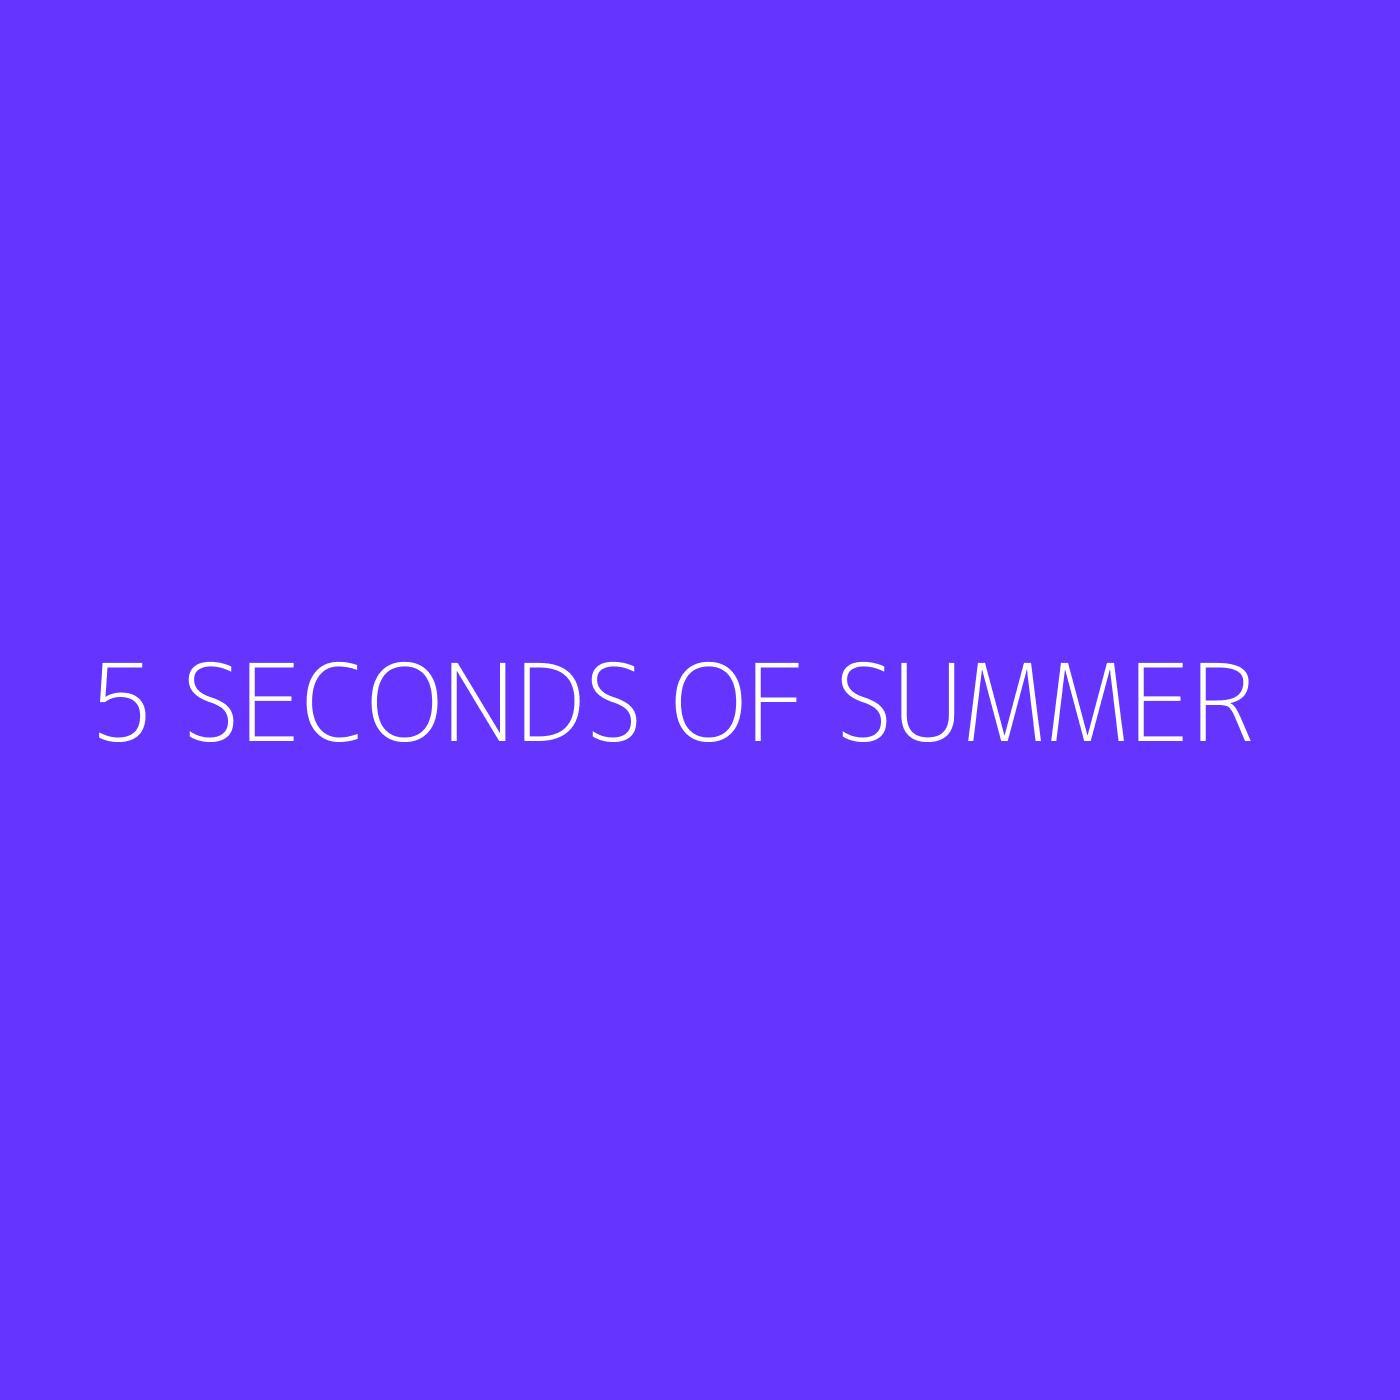 5 Seconds of Summer Playlist Artwork